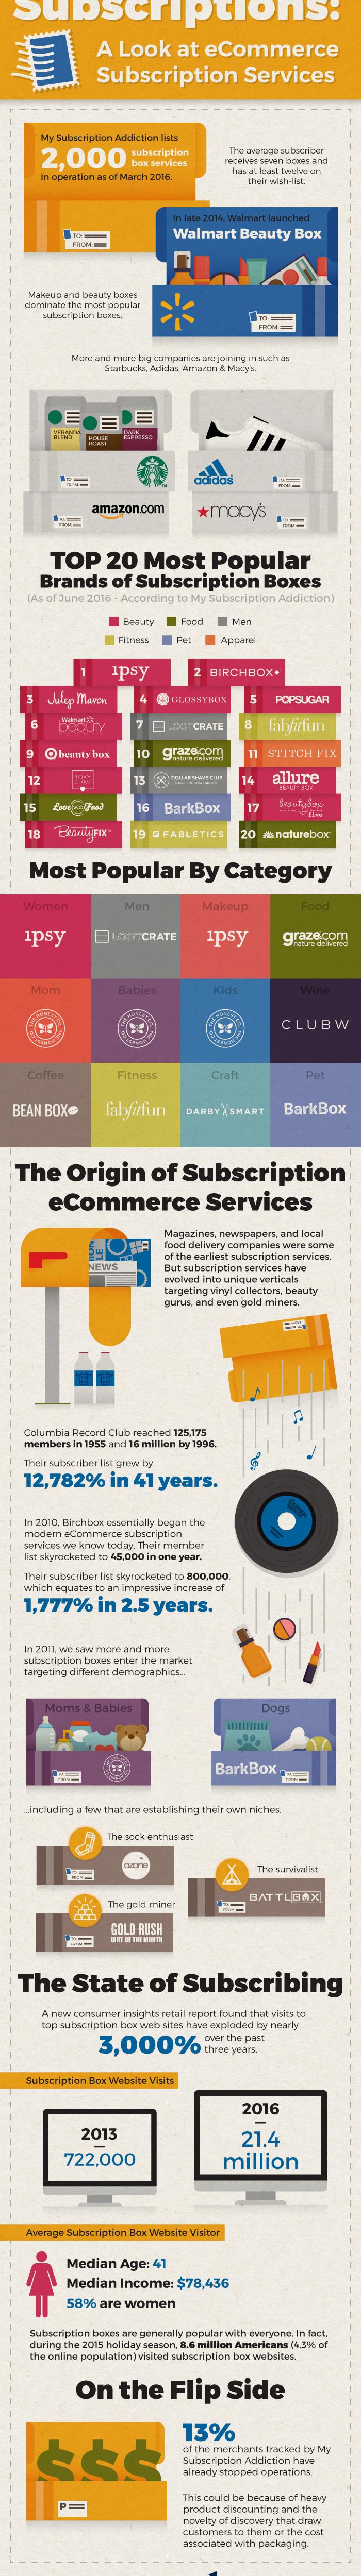 blog-shorr-packaging-ecommerce-subscription-boxes-custom-design-printing